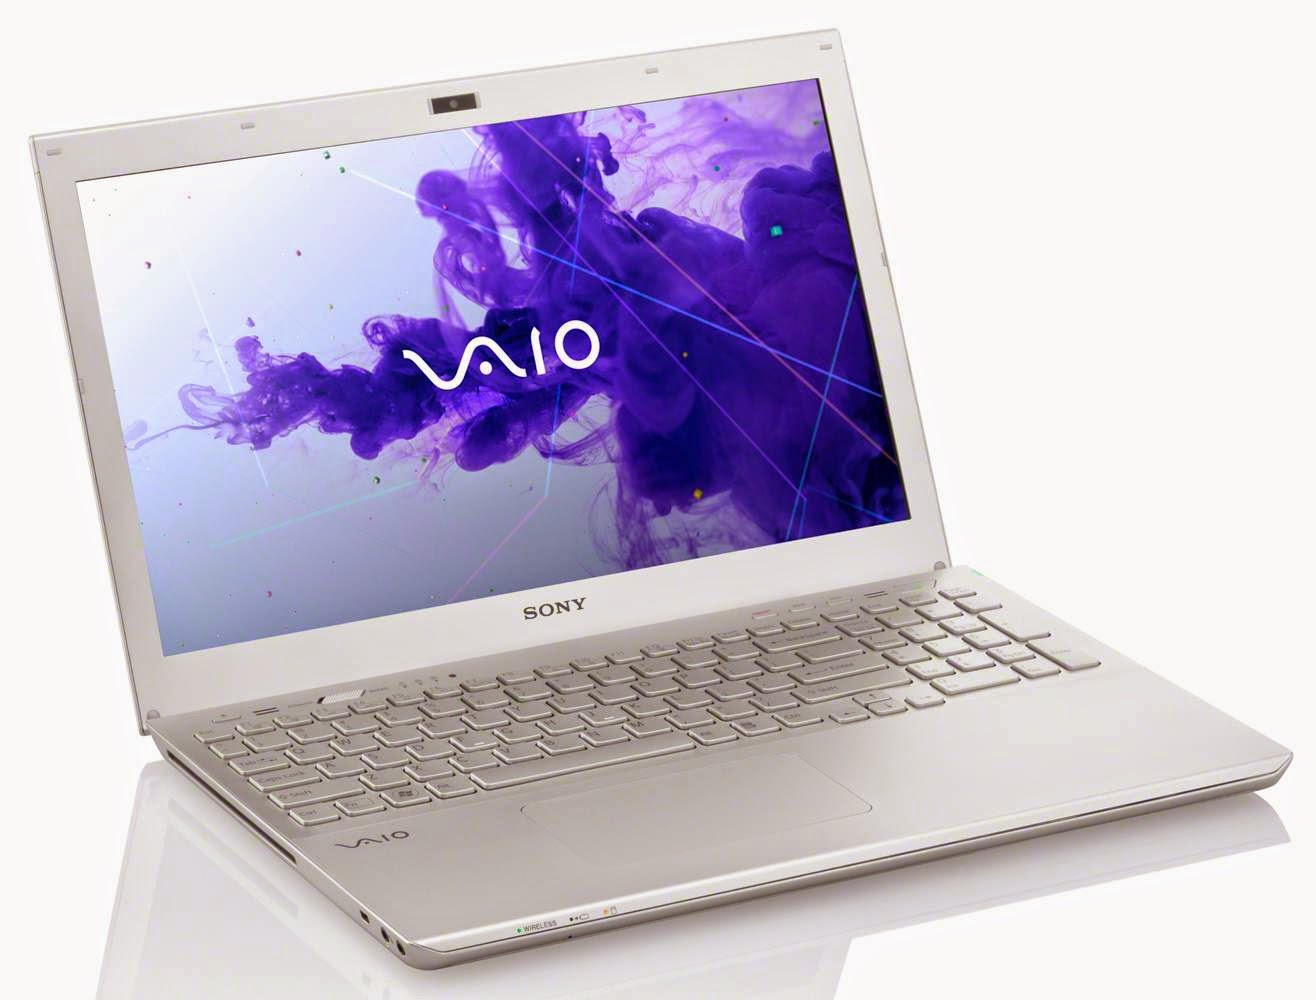 Cheap Laptops under 100 dollars